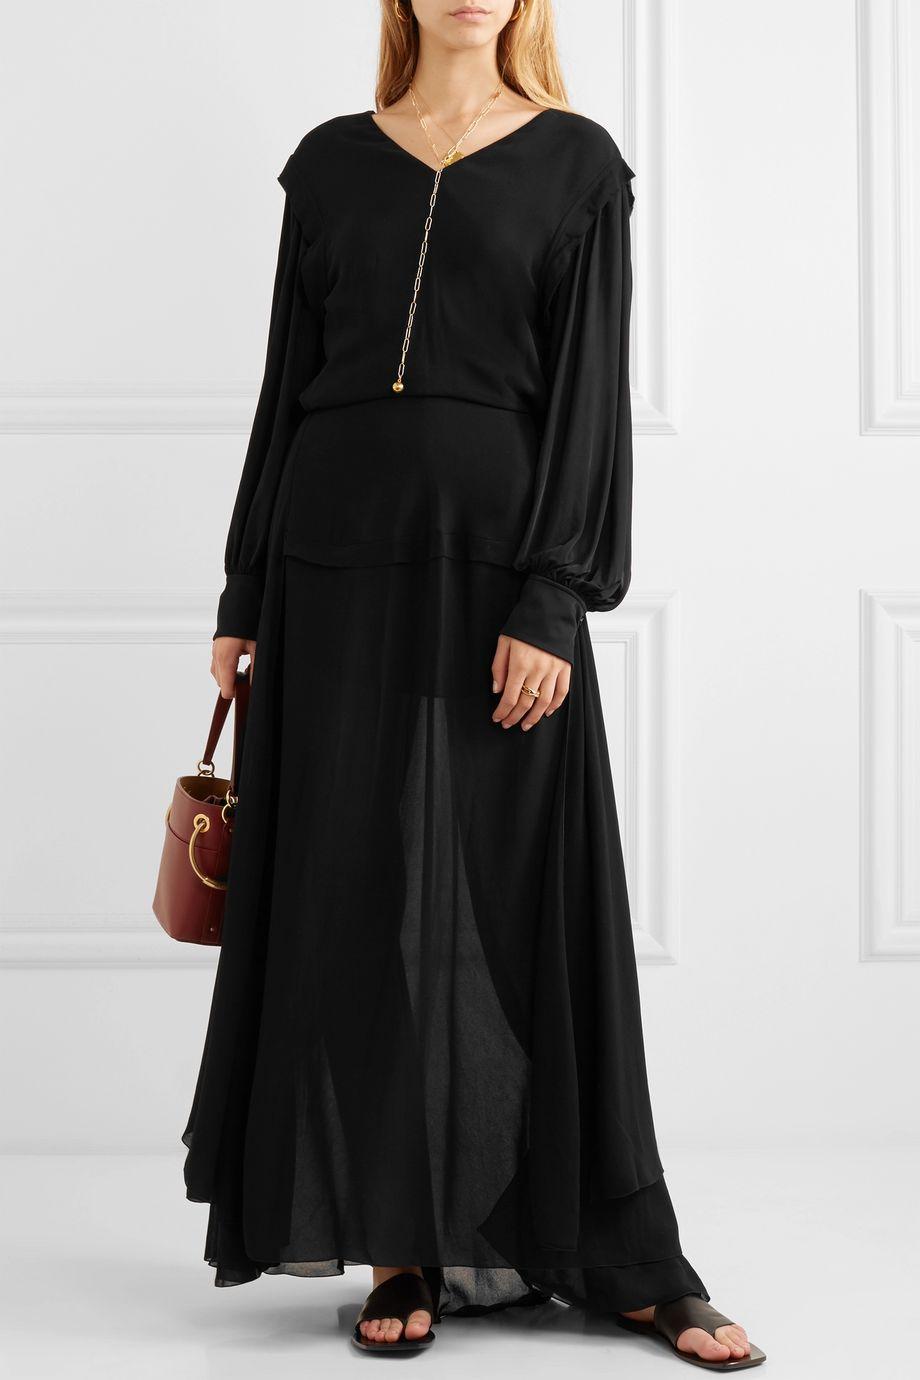 Chloé Satin-jersey and chiffon maxi dress